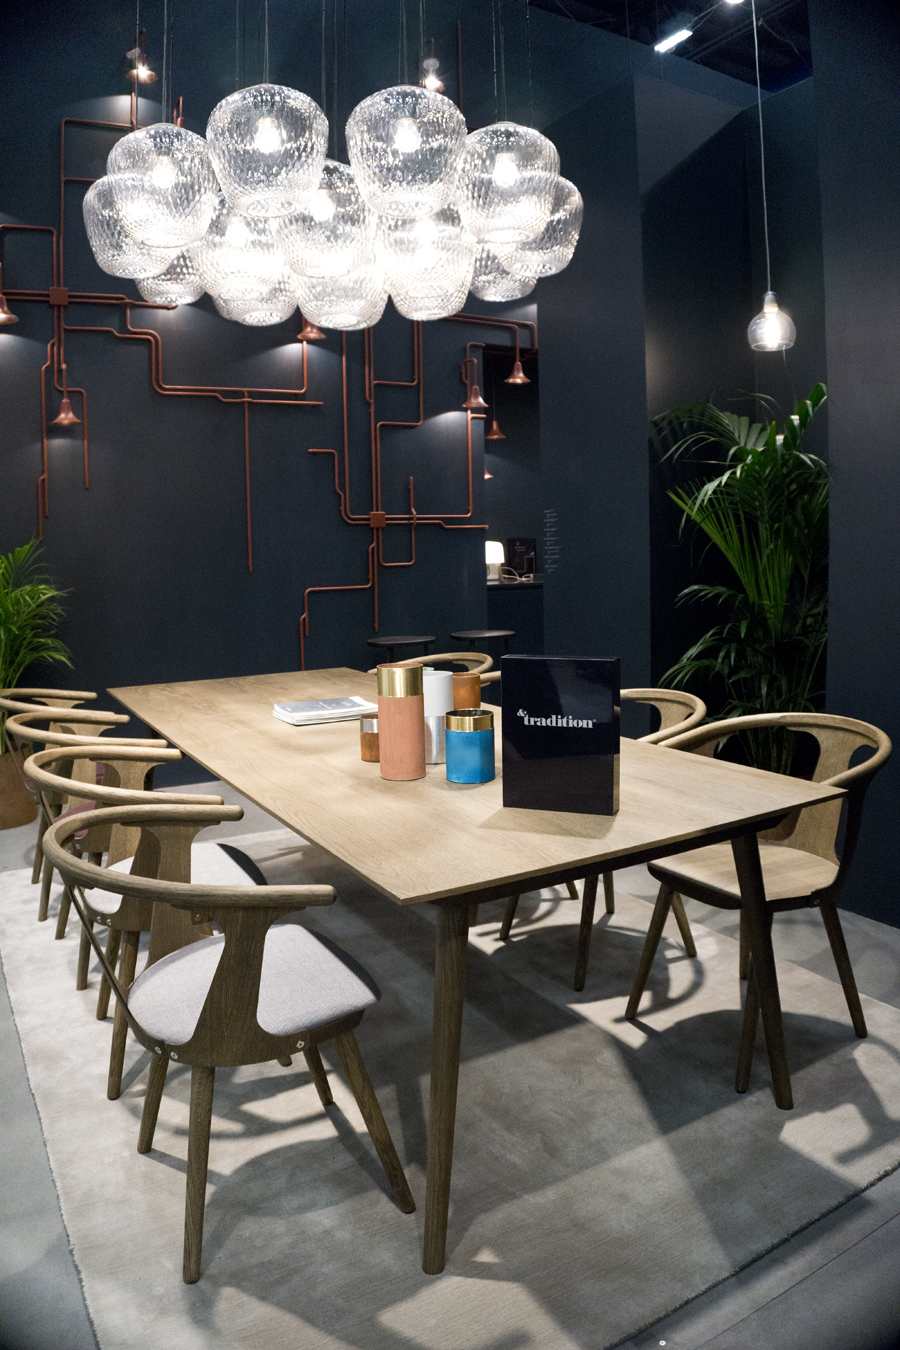 stockholm furniture & light fair &tradition